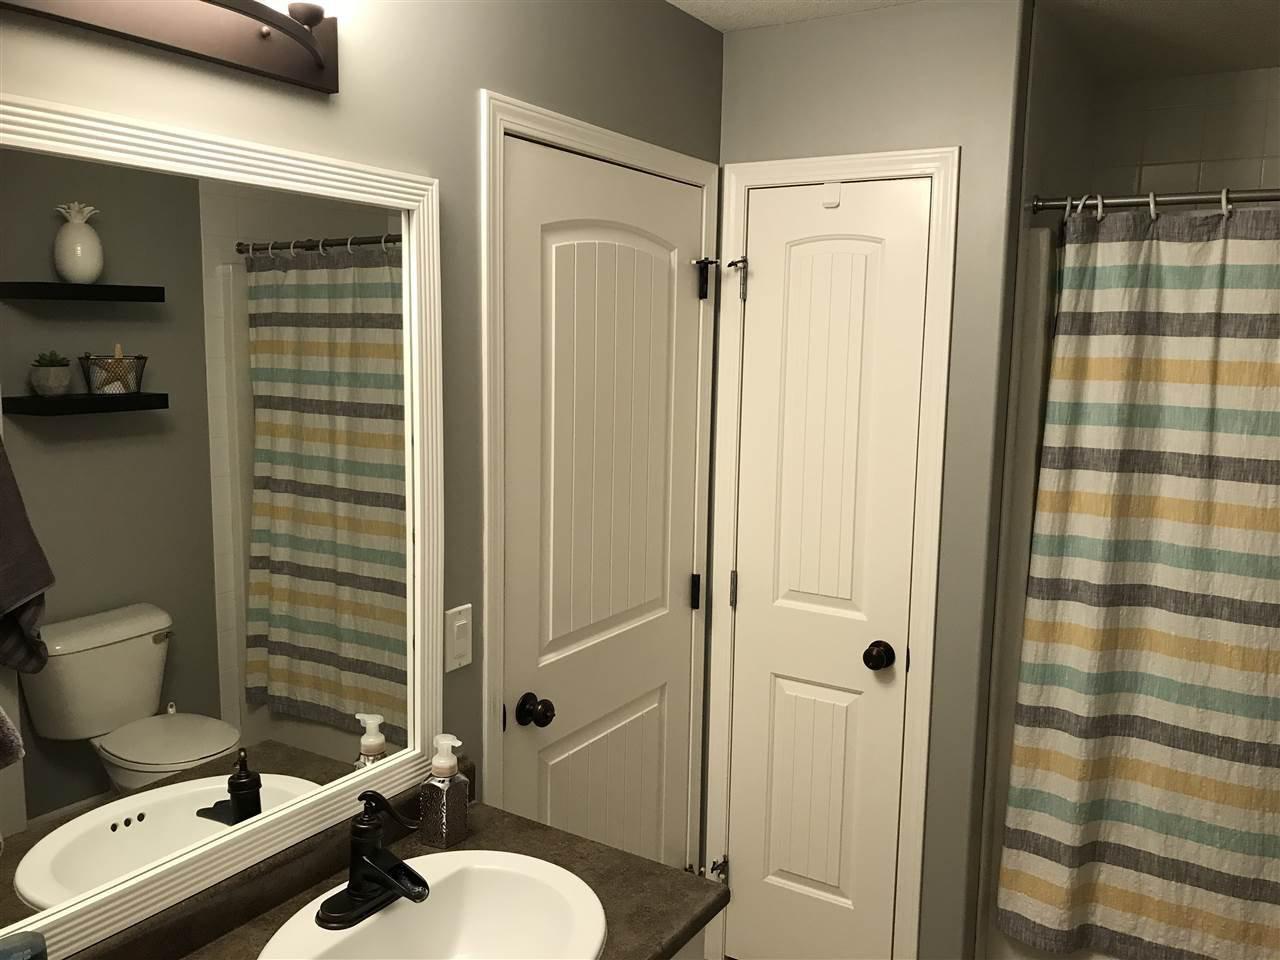 "Photo 9: Photos: 8724 114 Avenue in Fort St. John: Fort St. John - City NE House for sale in ""PANORAMA RIDGE"" (Fort St. John (Zone 60))  : MLS®# R2428633"